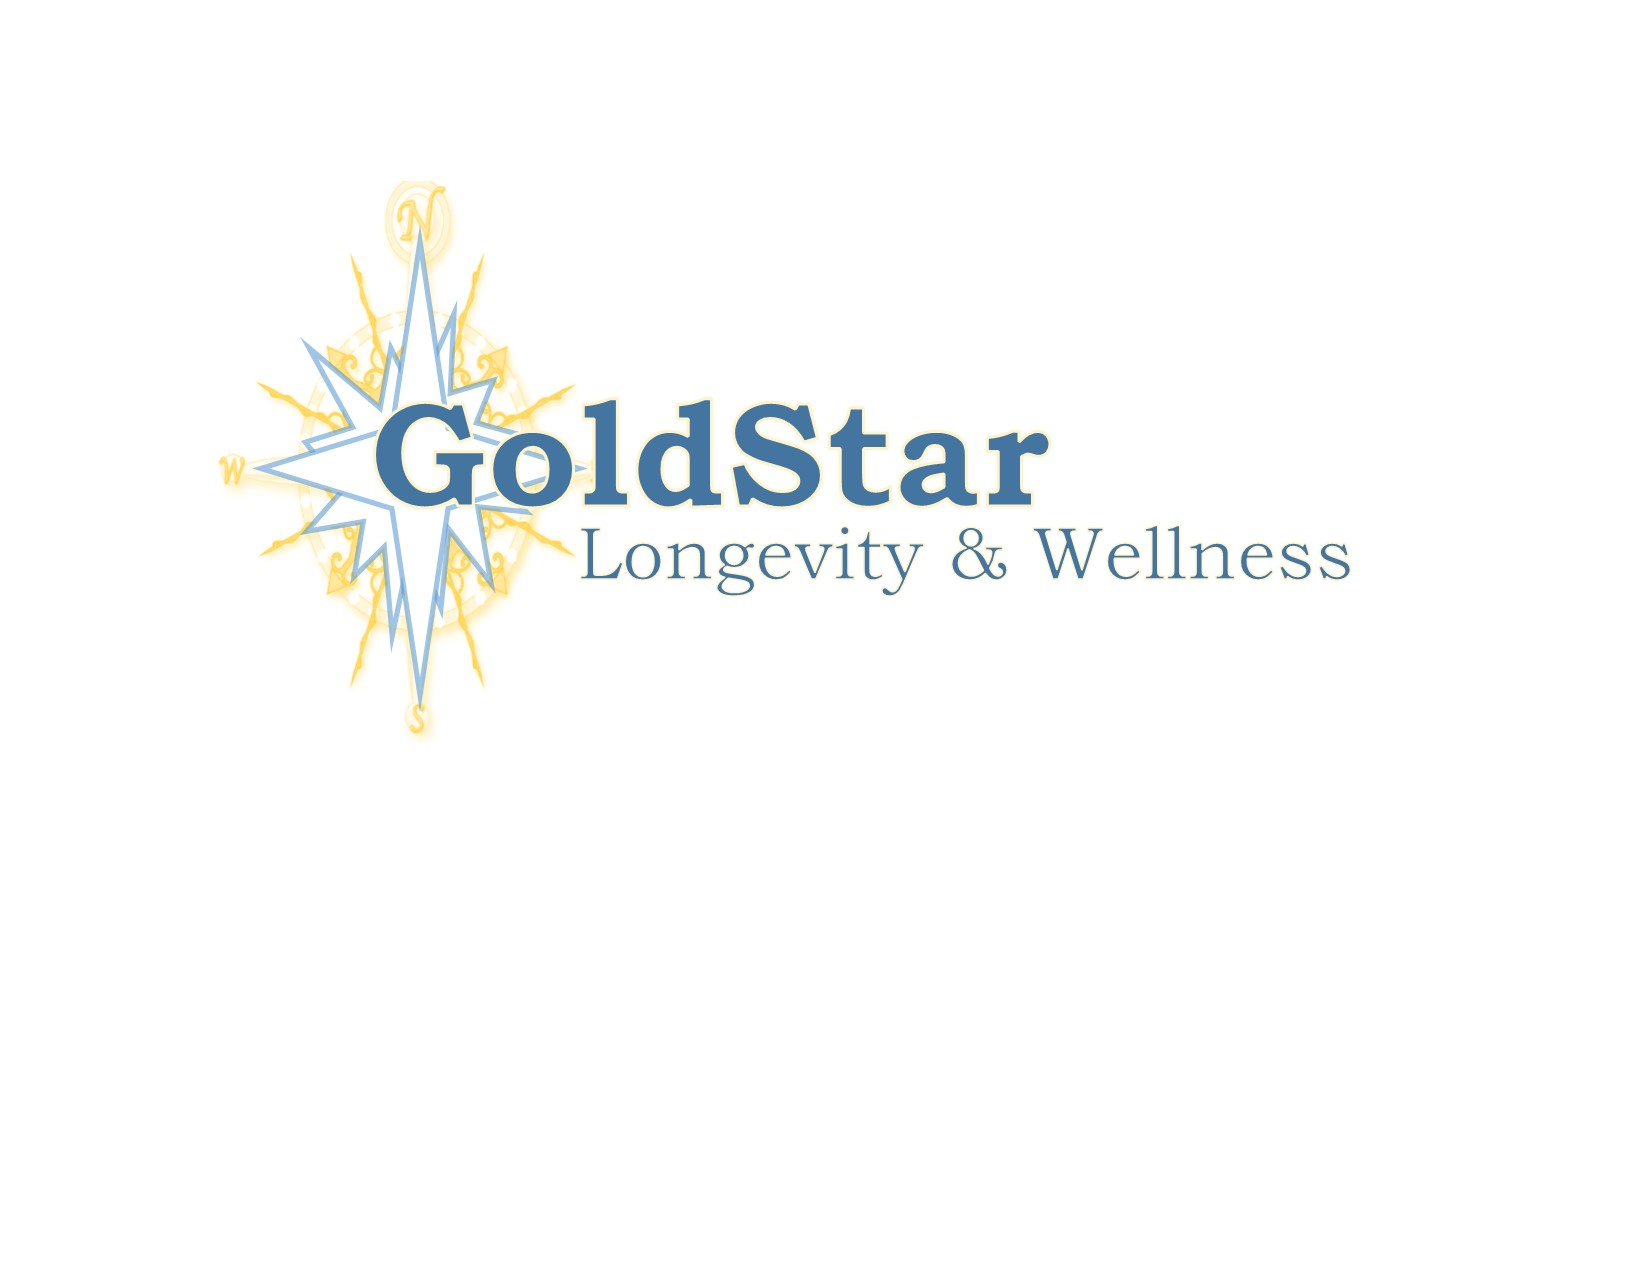 GoldStar Longevity & Wellness